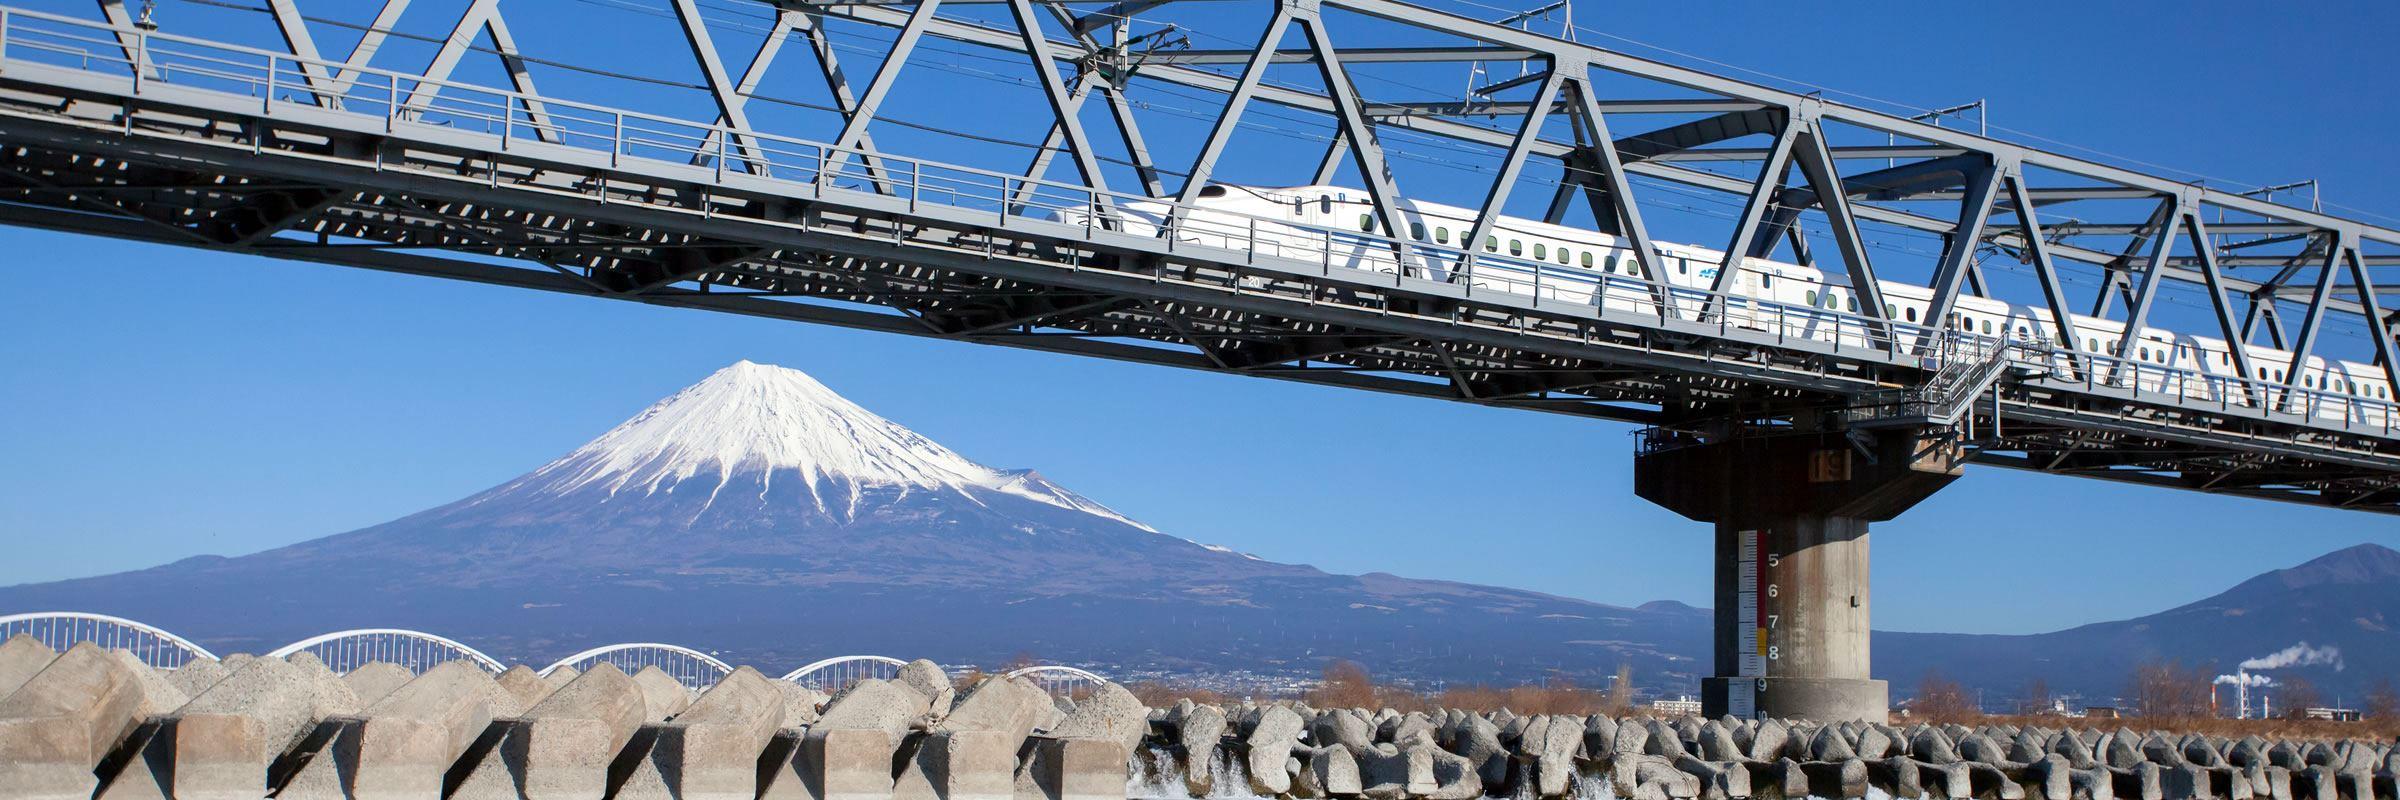 Shinkansen bullet train and Mount Fuji